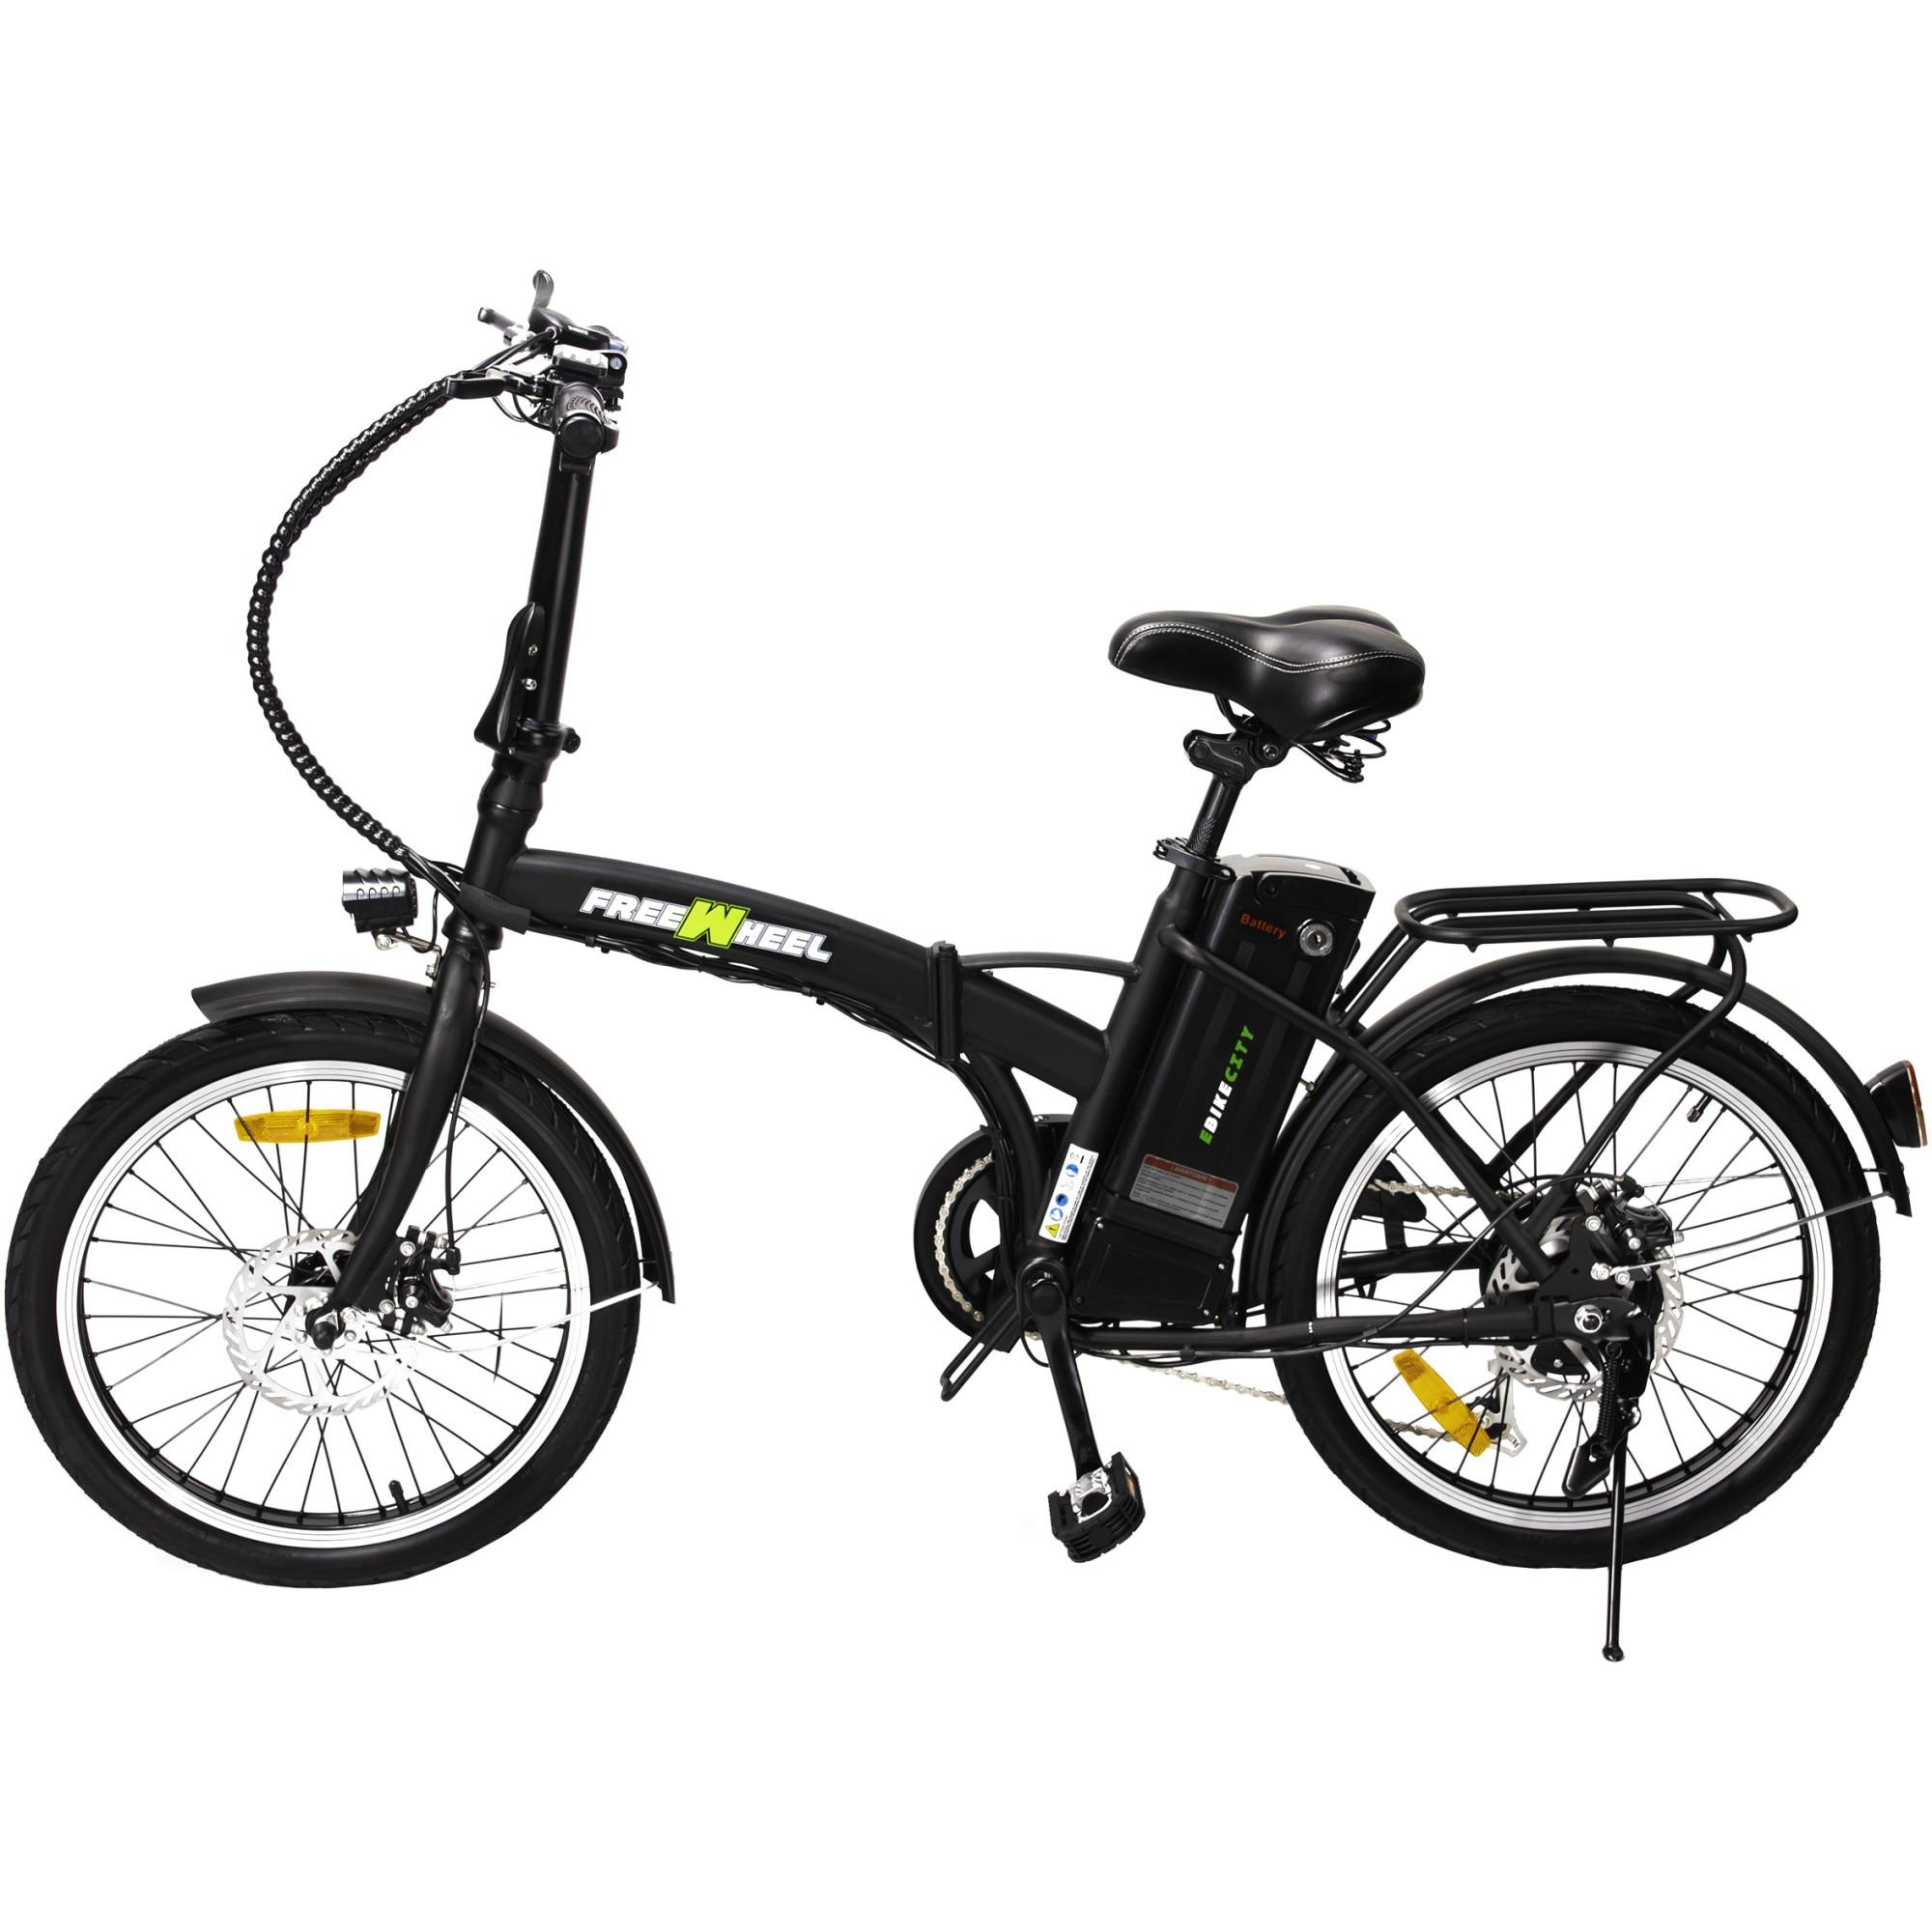 "Fotografie Bicicleta electrica FreeWheel E-bike City, Pliabila, Roti 20"", Frana disc fata/spate, Motor 250W, Autonomie pana la 35Km, Viteza maxima 25Km/h, Negru"